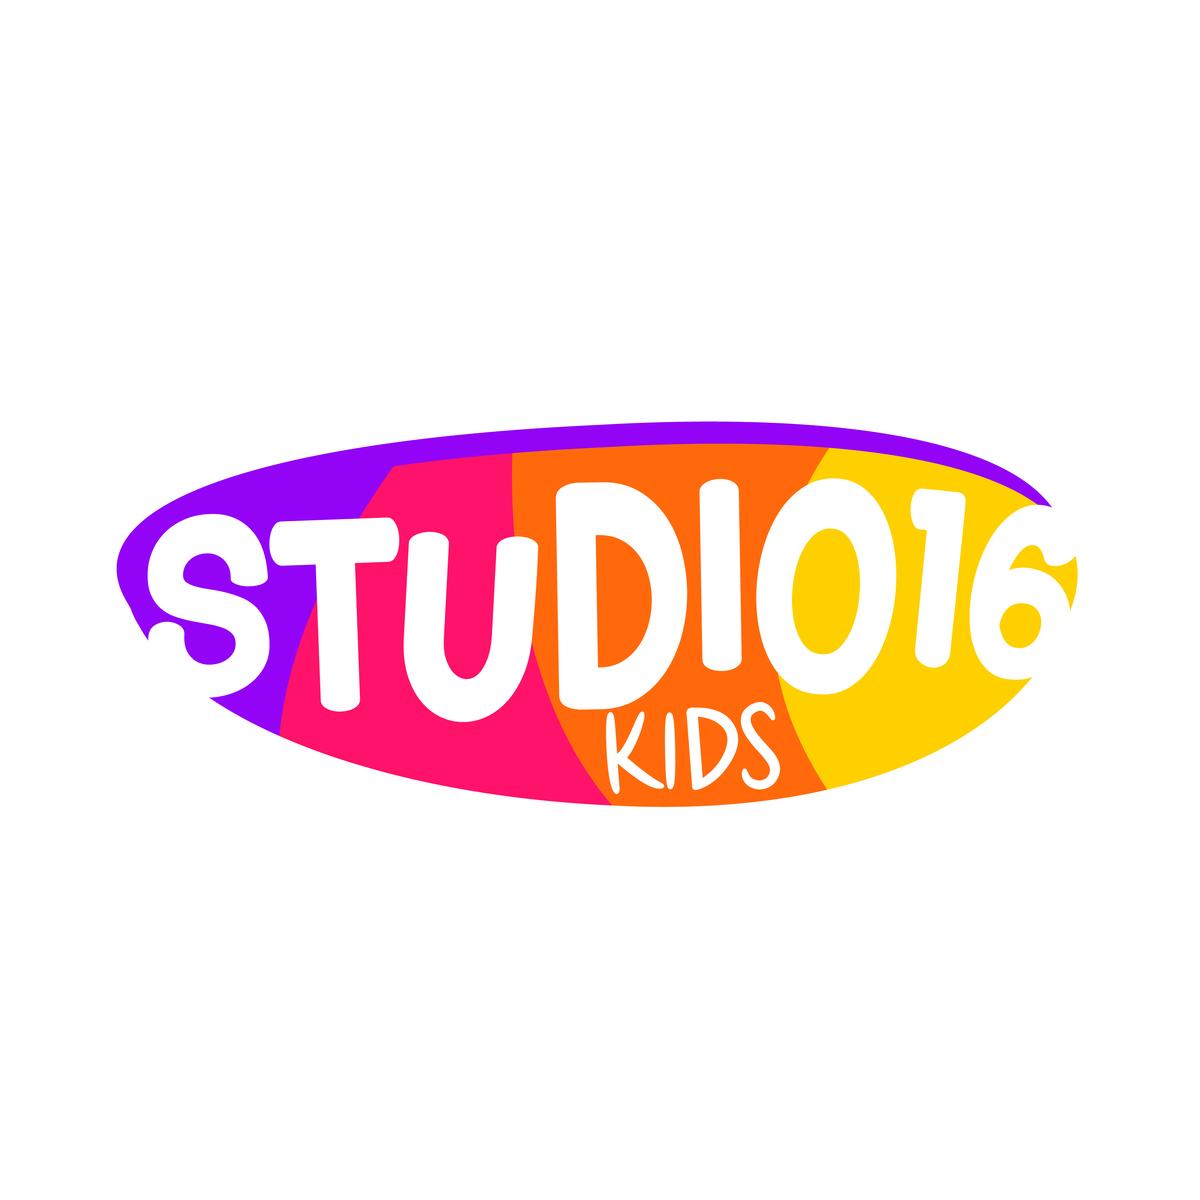 Imagem capa - Maio/2019  - Studio16 Kids por Studio16 Fotografia